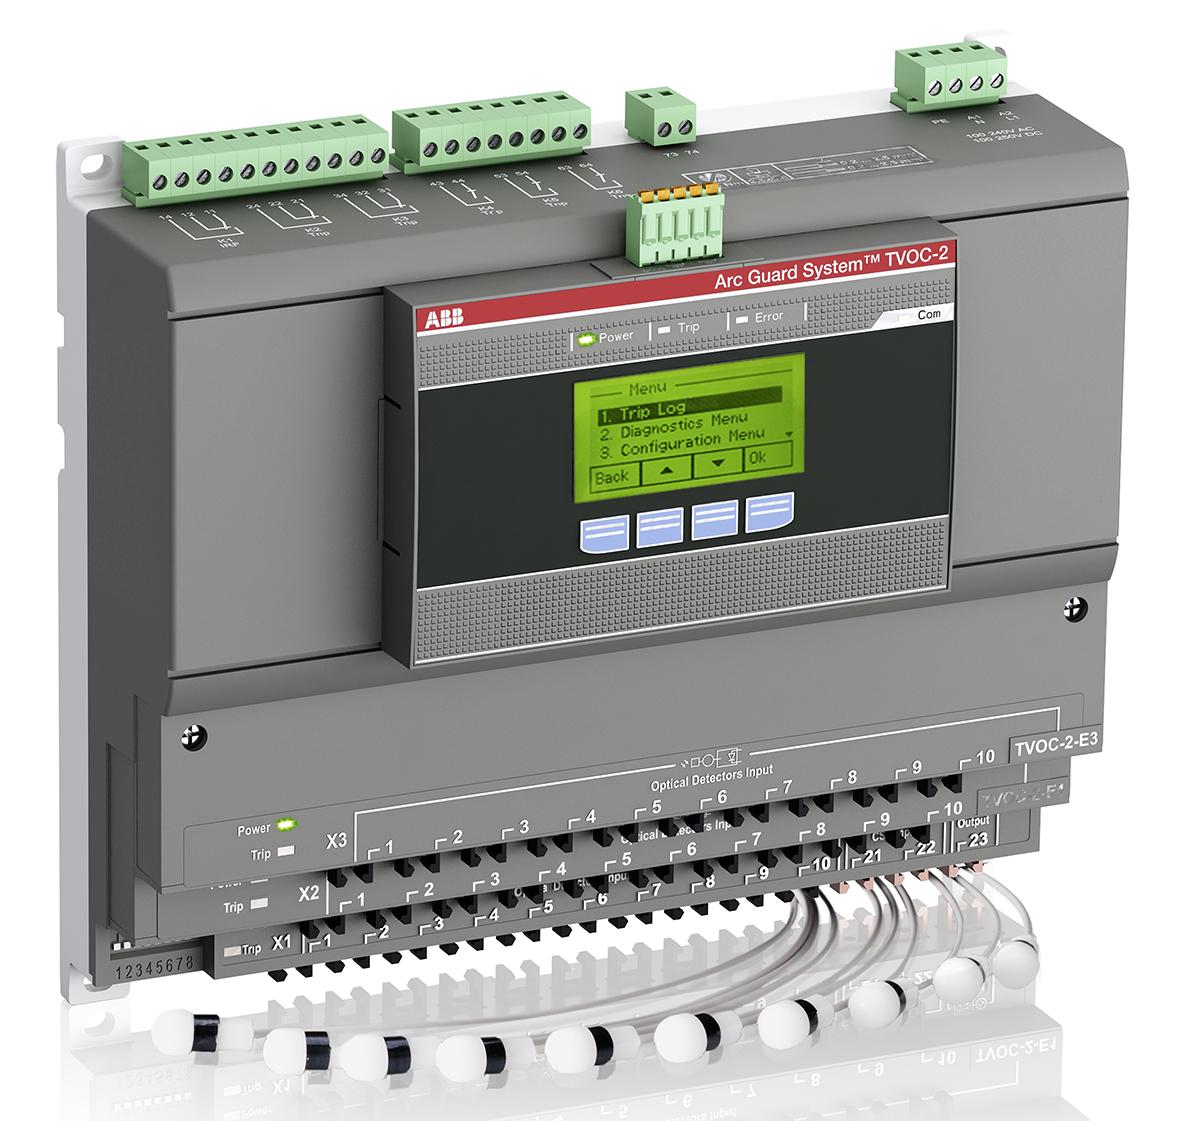 Arc Guard System™ – TVOC-2